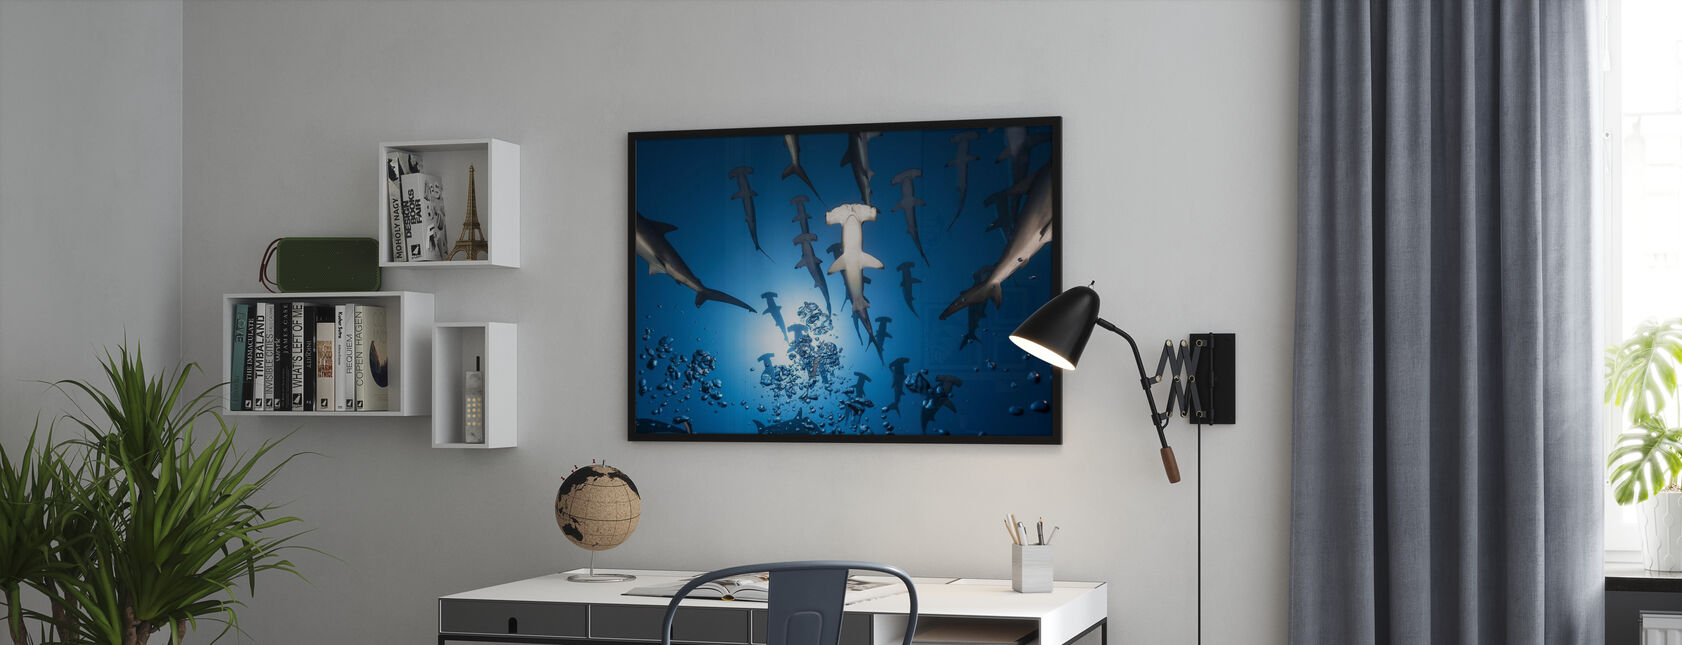 Hammerhead Shark - Poster - Office